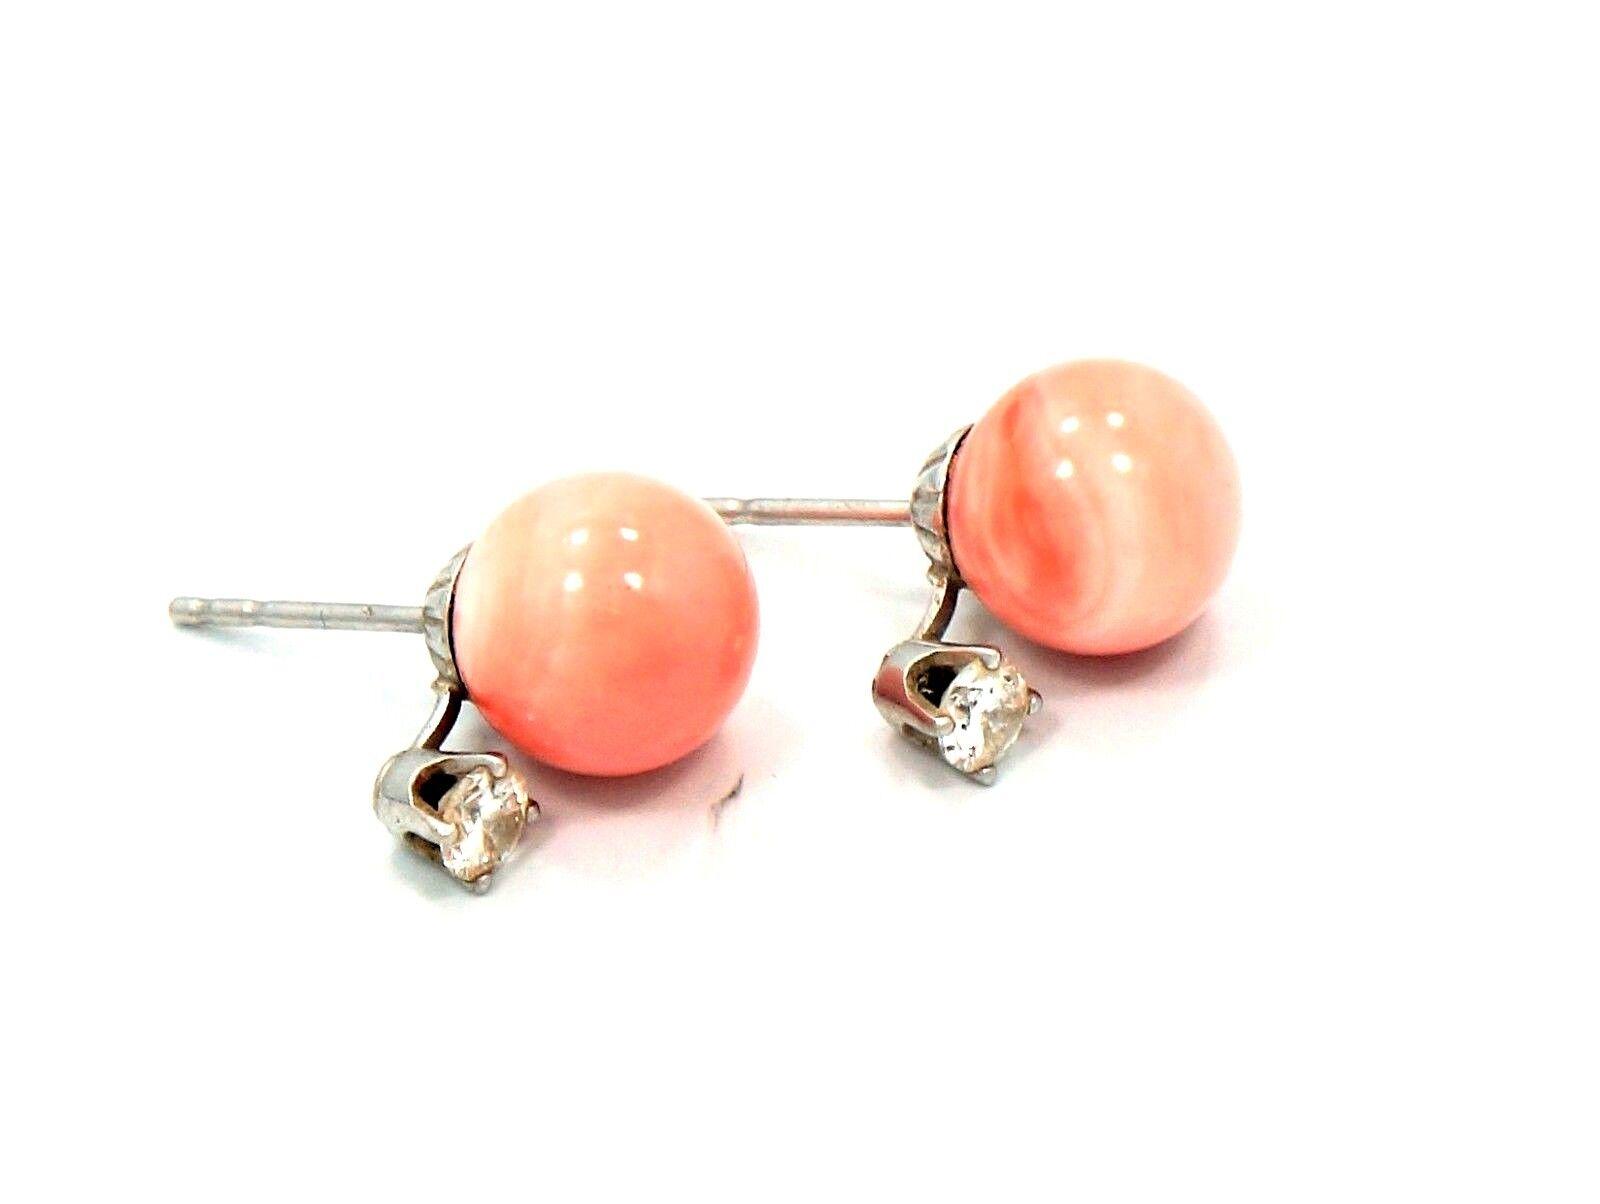 1 3 Cttw Diamond and Angel Skin Pink Coral Stud Earrings